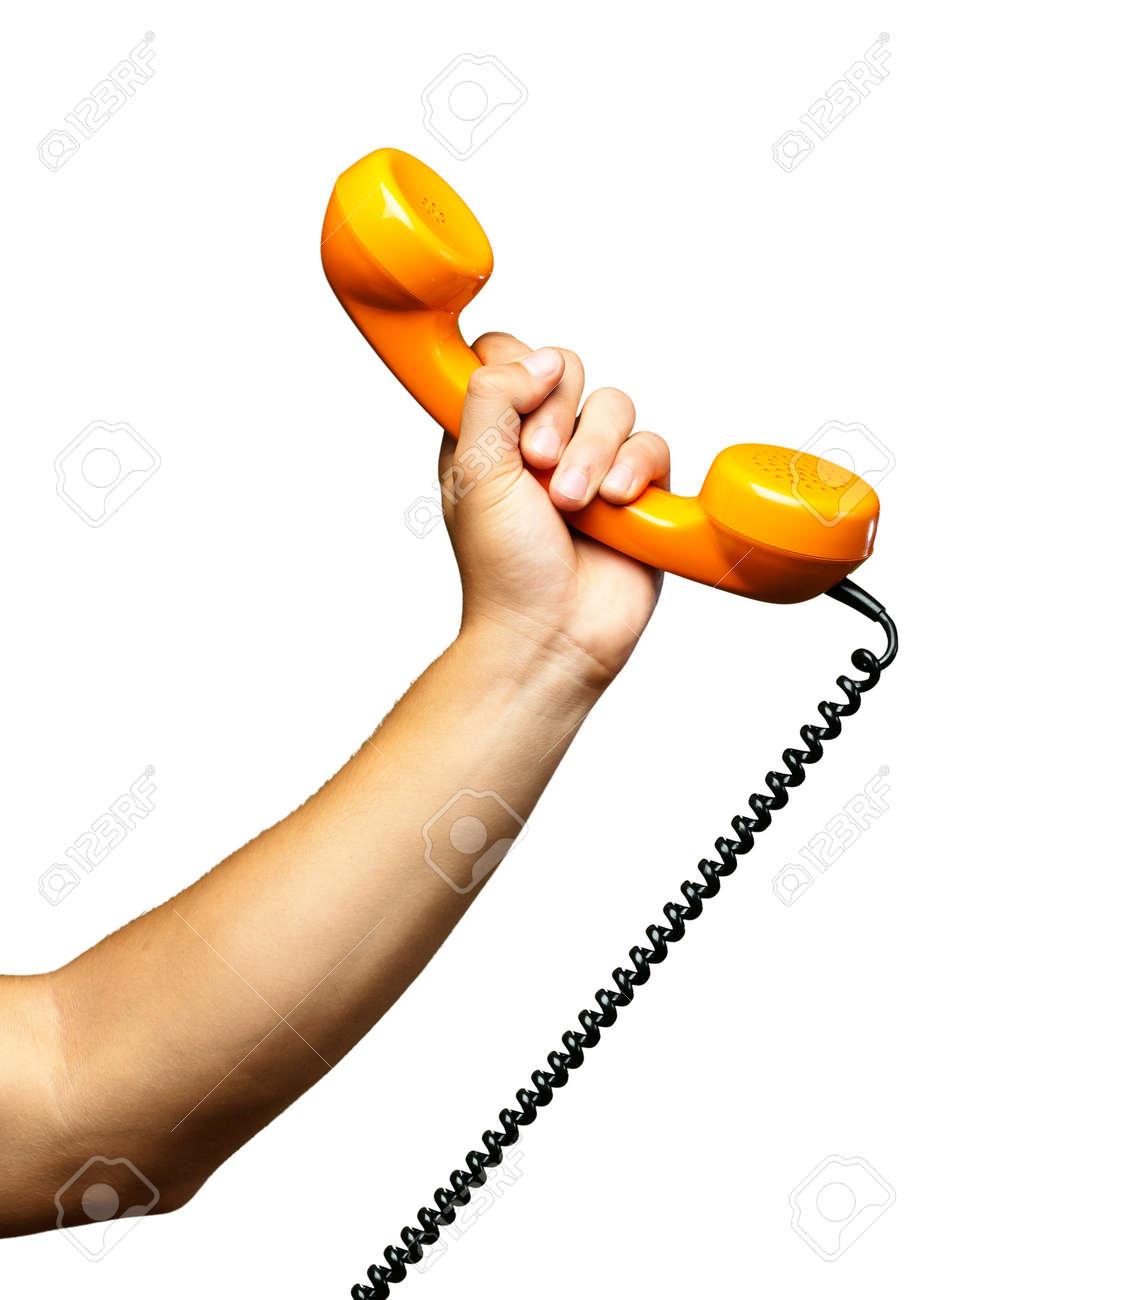 Close Up Of Hand Holding Telephone On White Background - 18554934